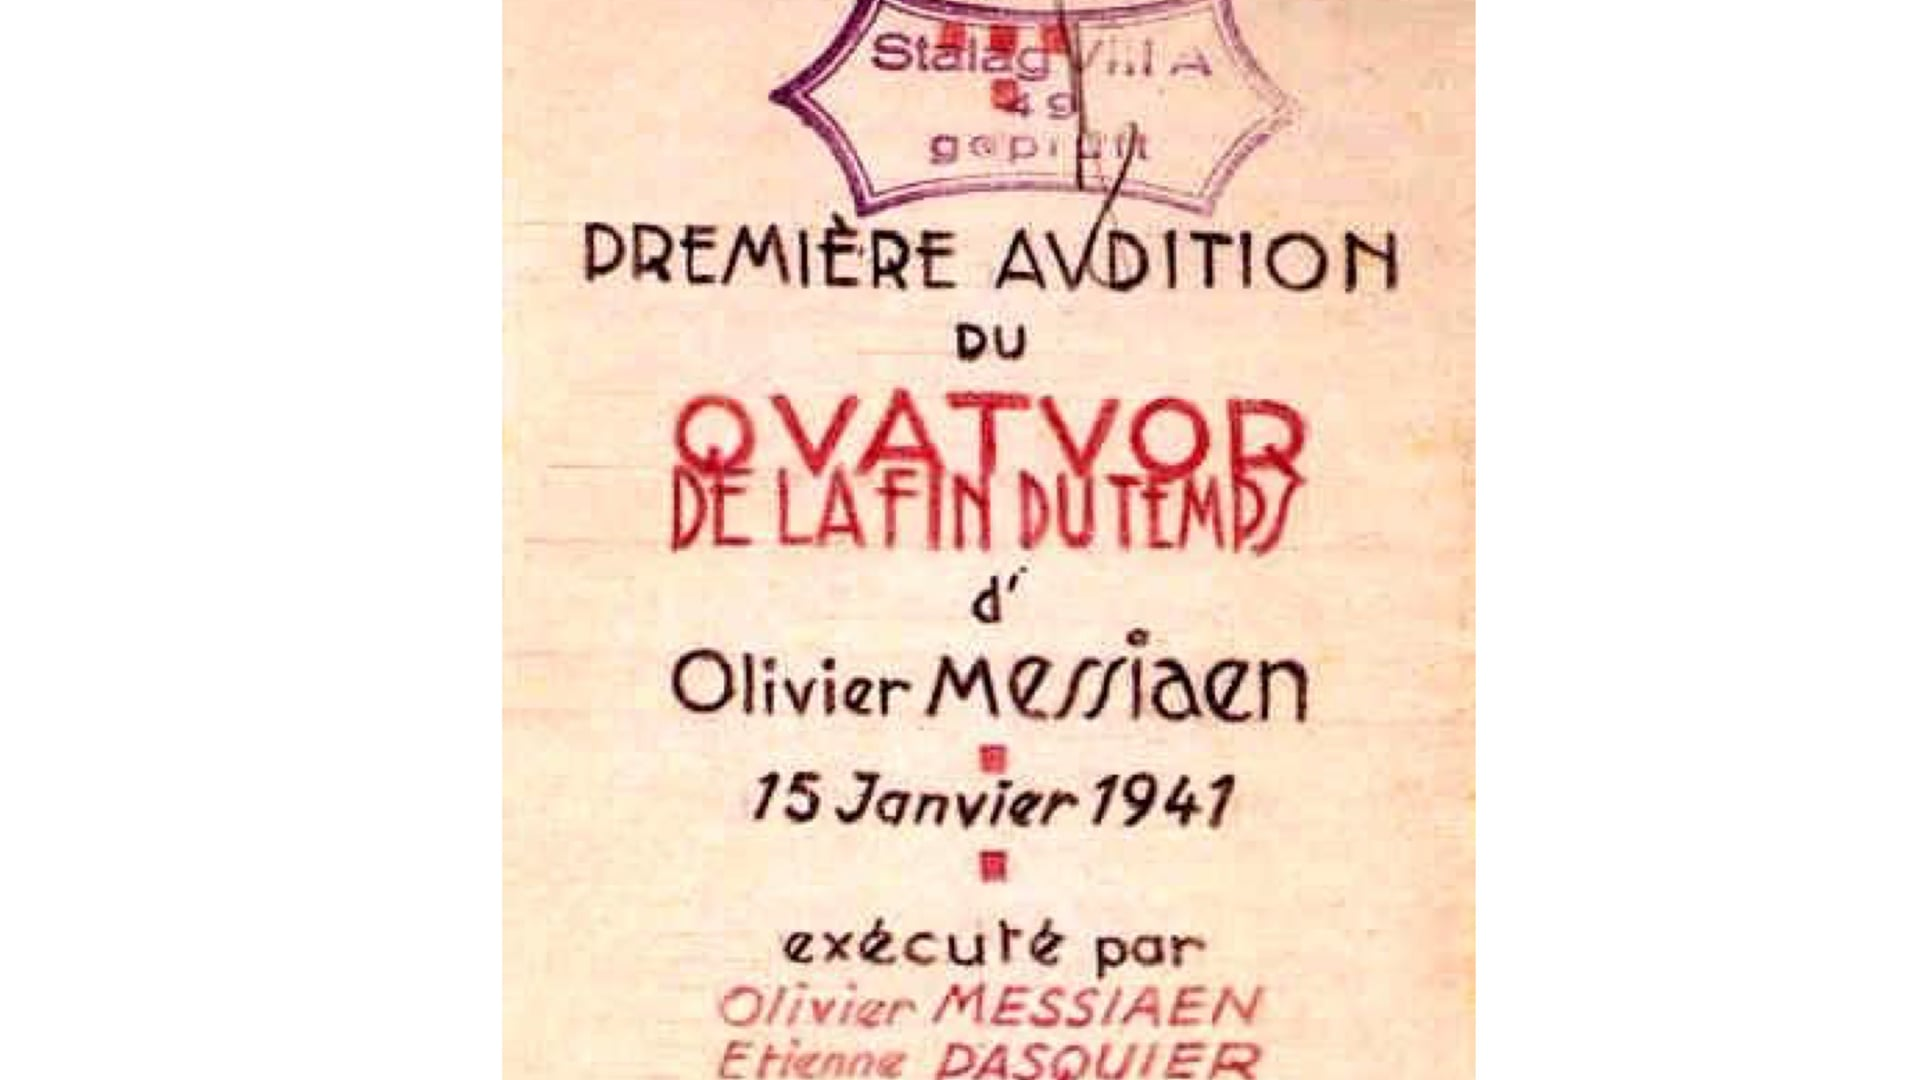 Olivier Messiaen - Quartet for the End of Time III. Abîme des Oiseaux